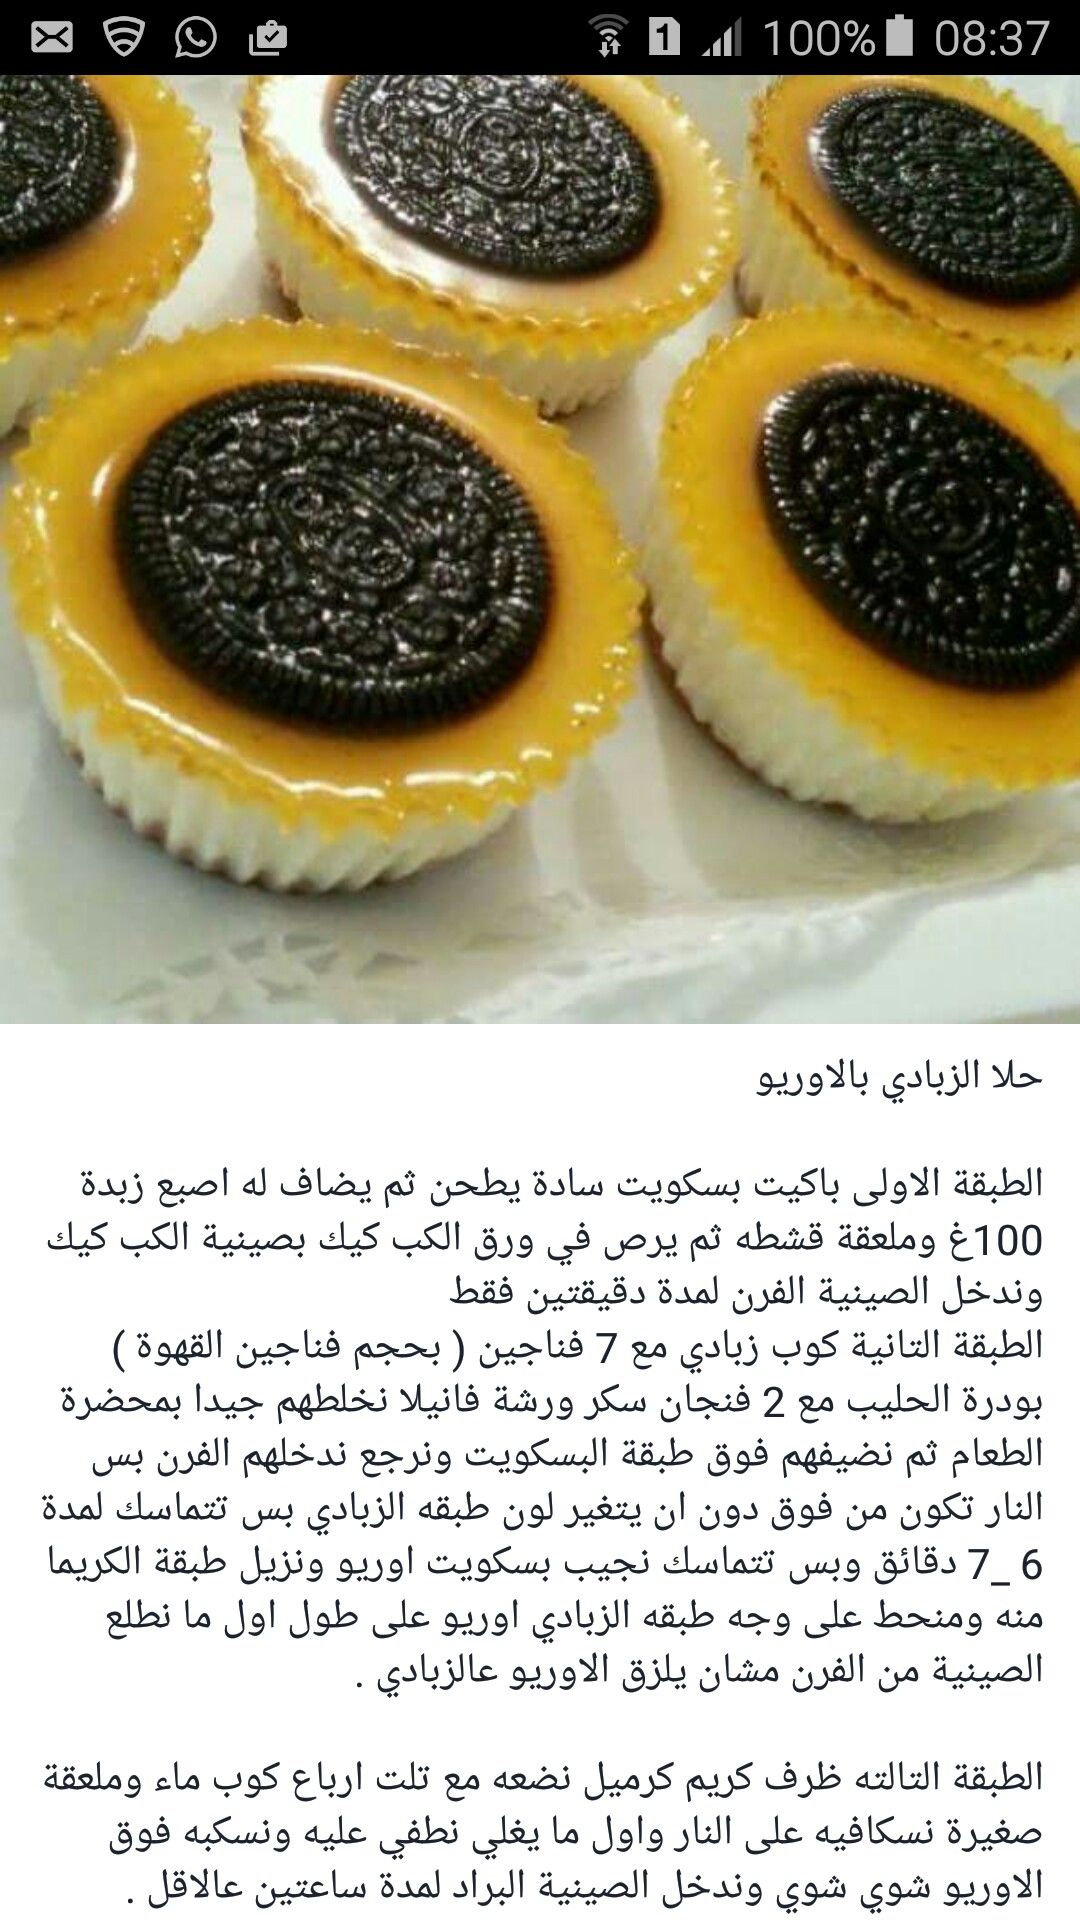 حلا الزبادي بالأوريو Food Cooking Desserts